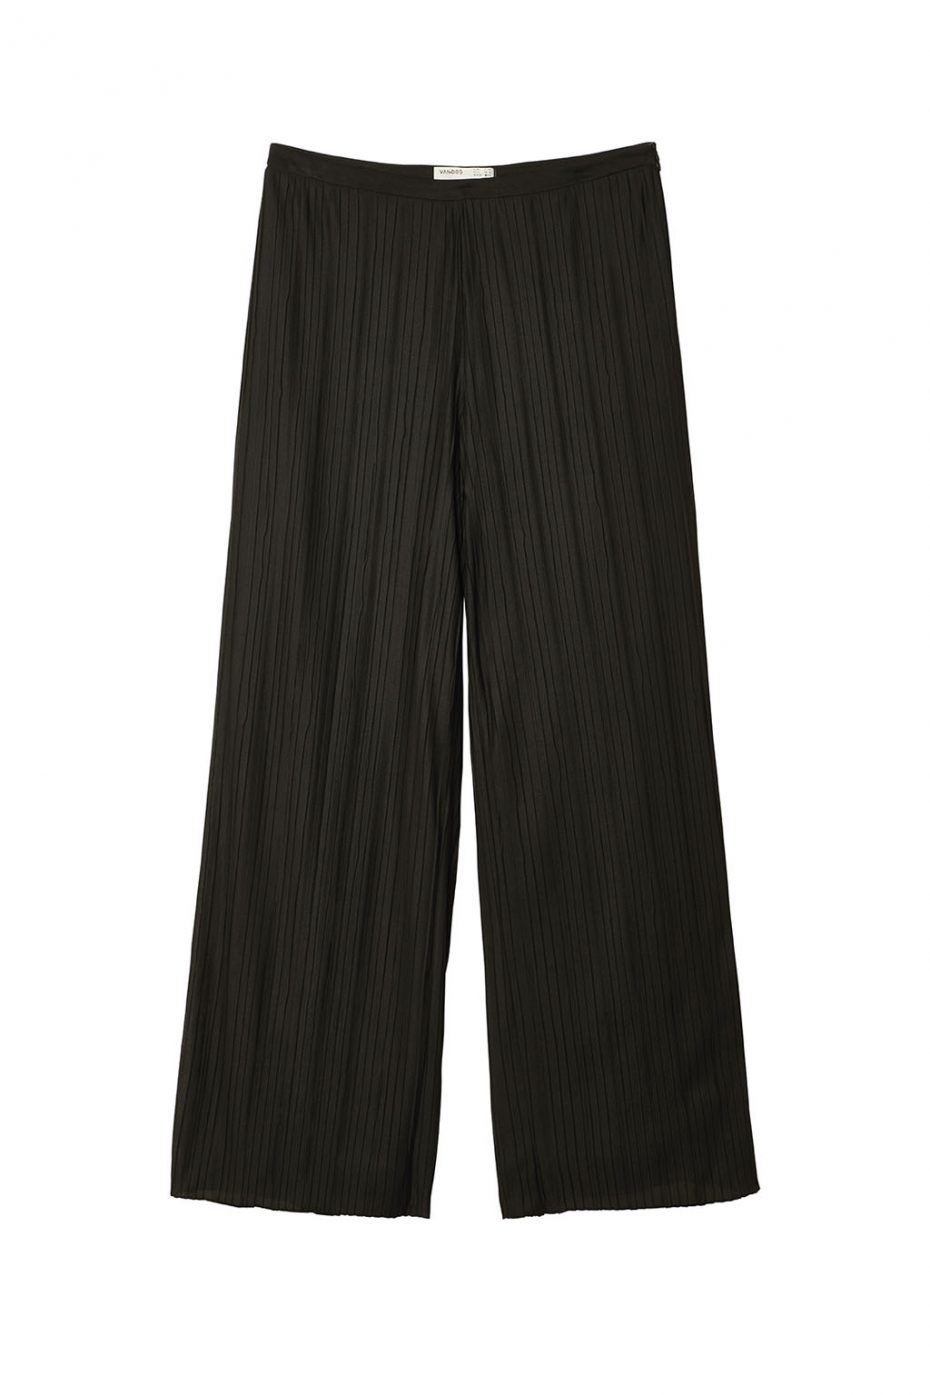 Pantalon Ancho Plisado Negro de Vandos